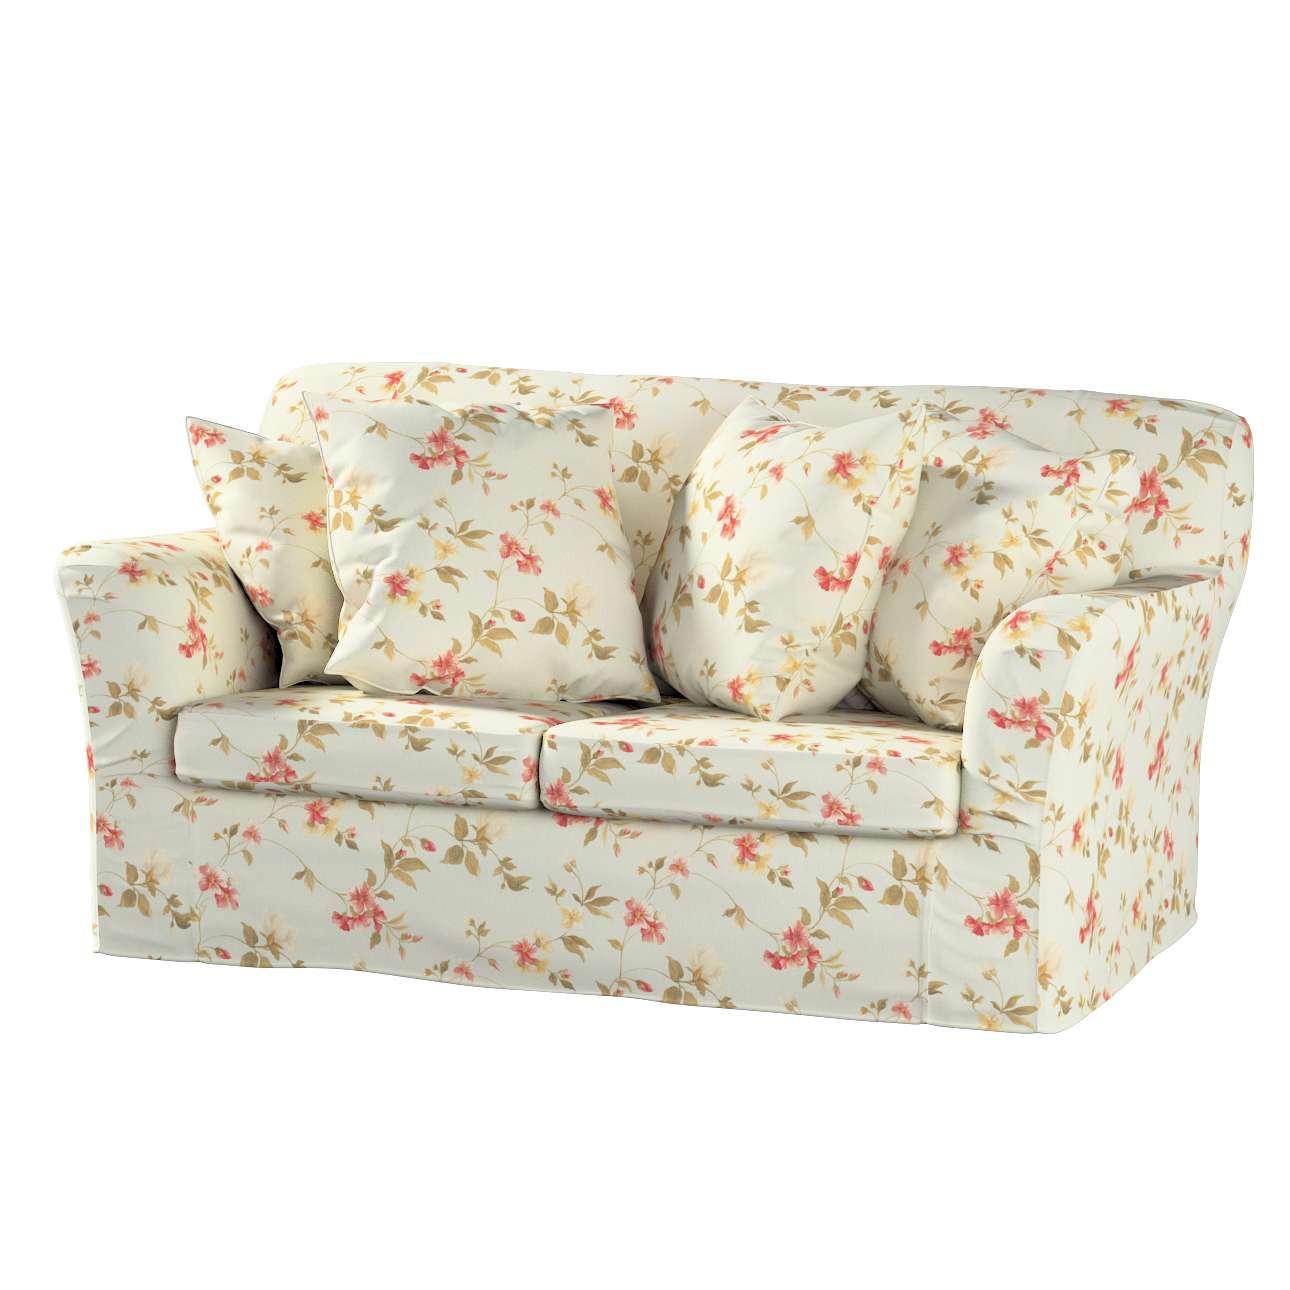 Tomelilla 2-seater sofa cover Tomelilla 2-seat sofa in collection Londres, fabric: 124-65